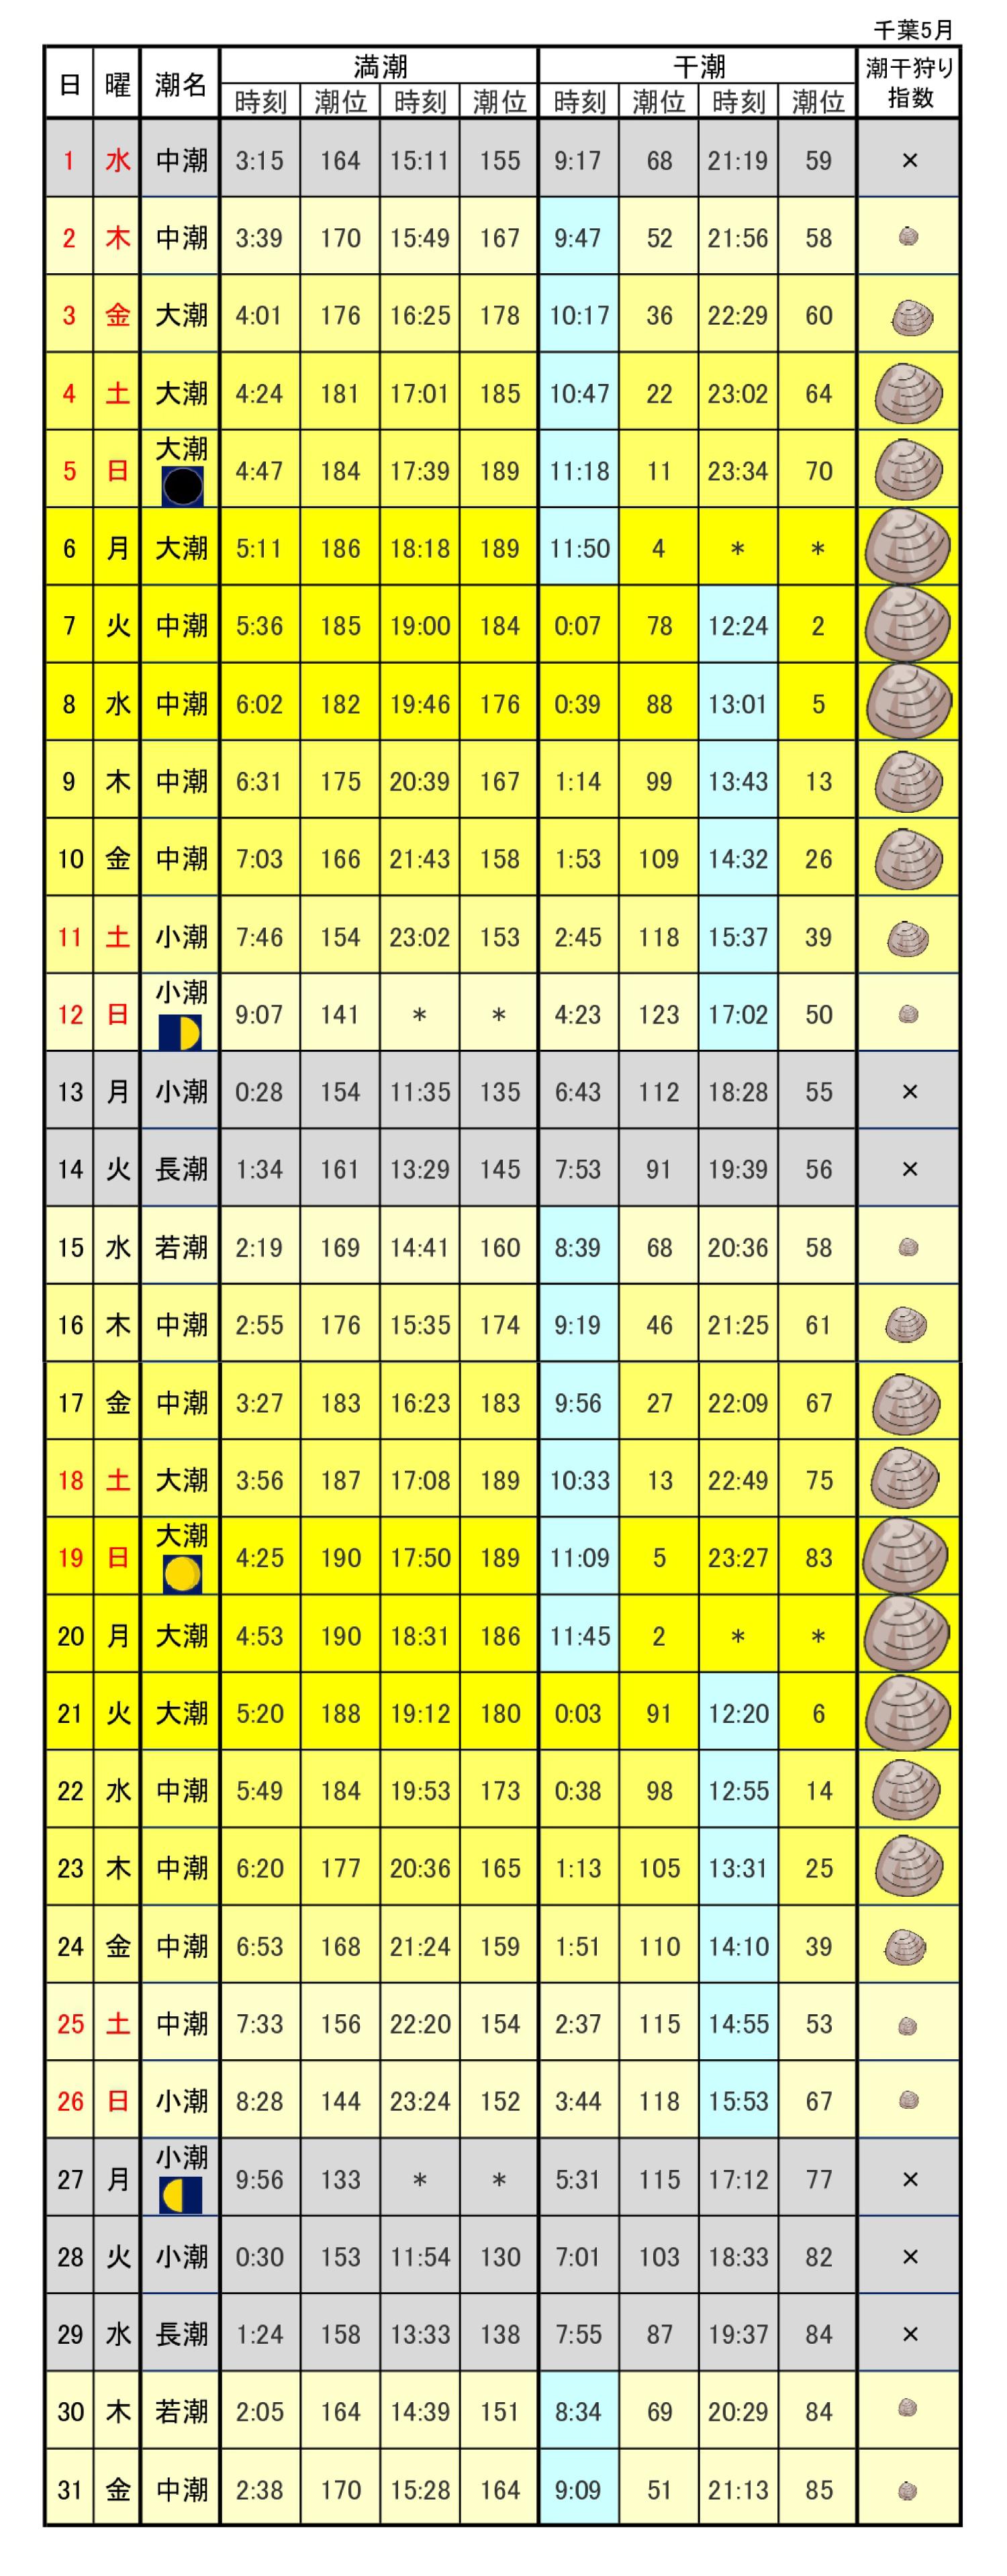 潮干狩り場潮汐表千葉県2019年5月